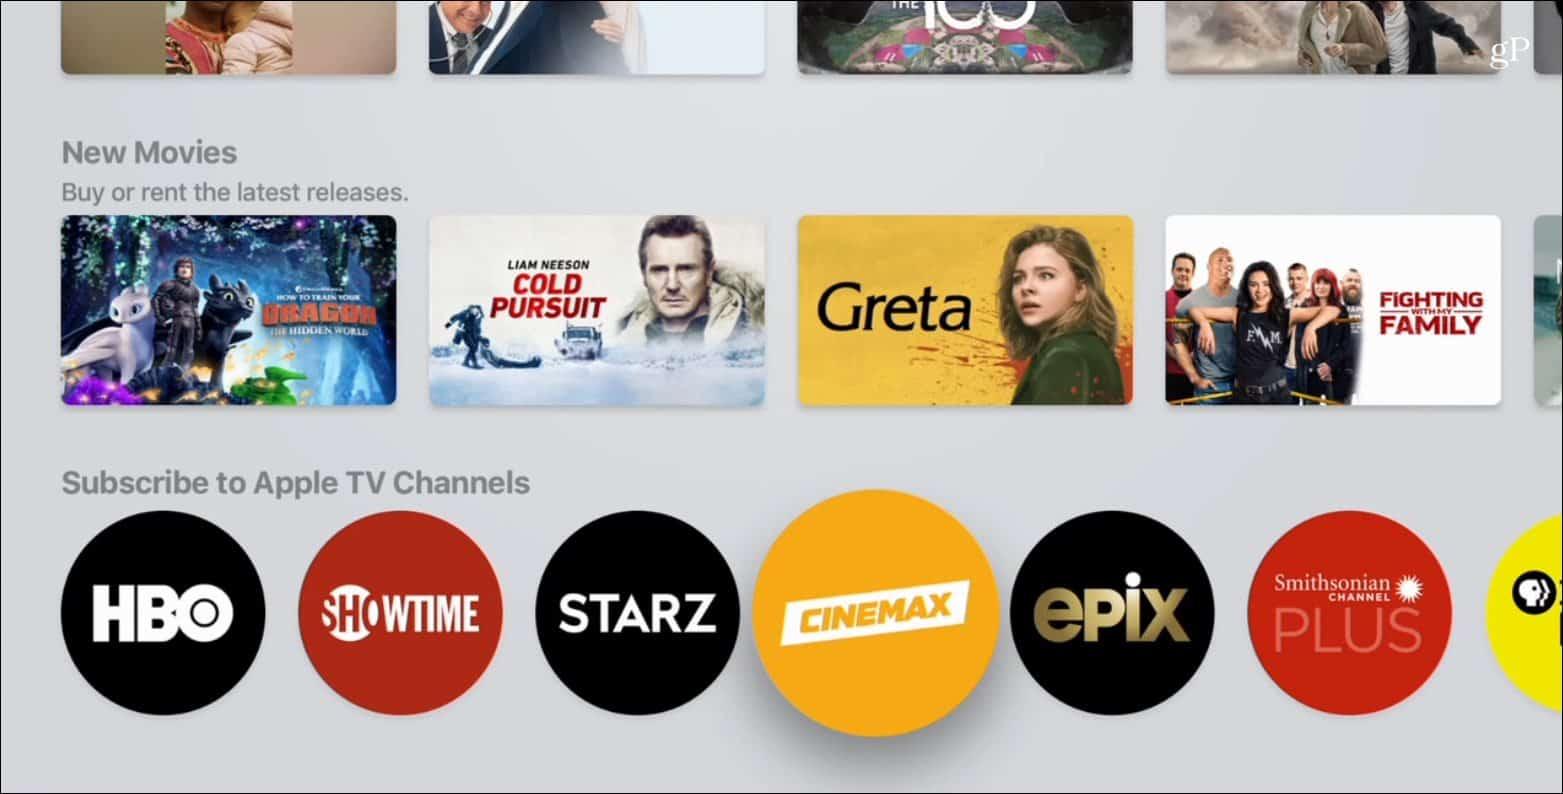 Apple TV Premium Channels